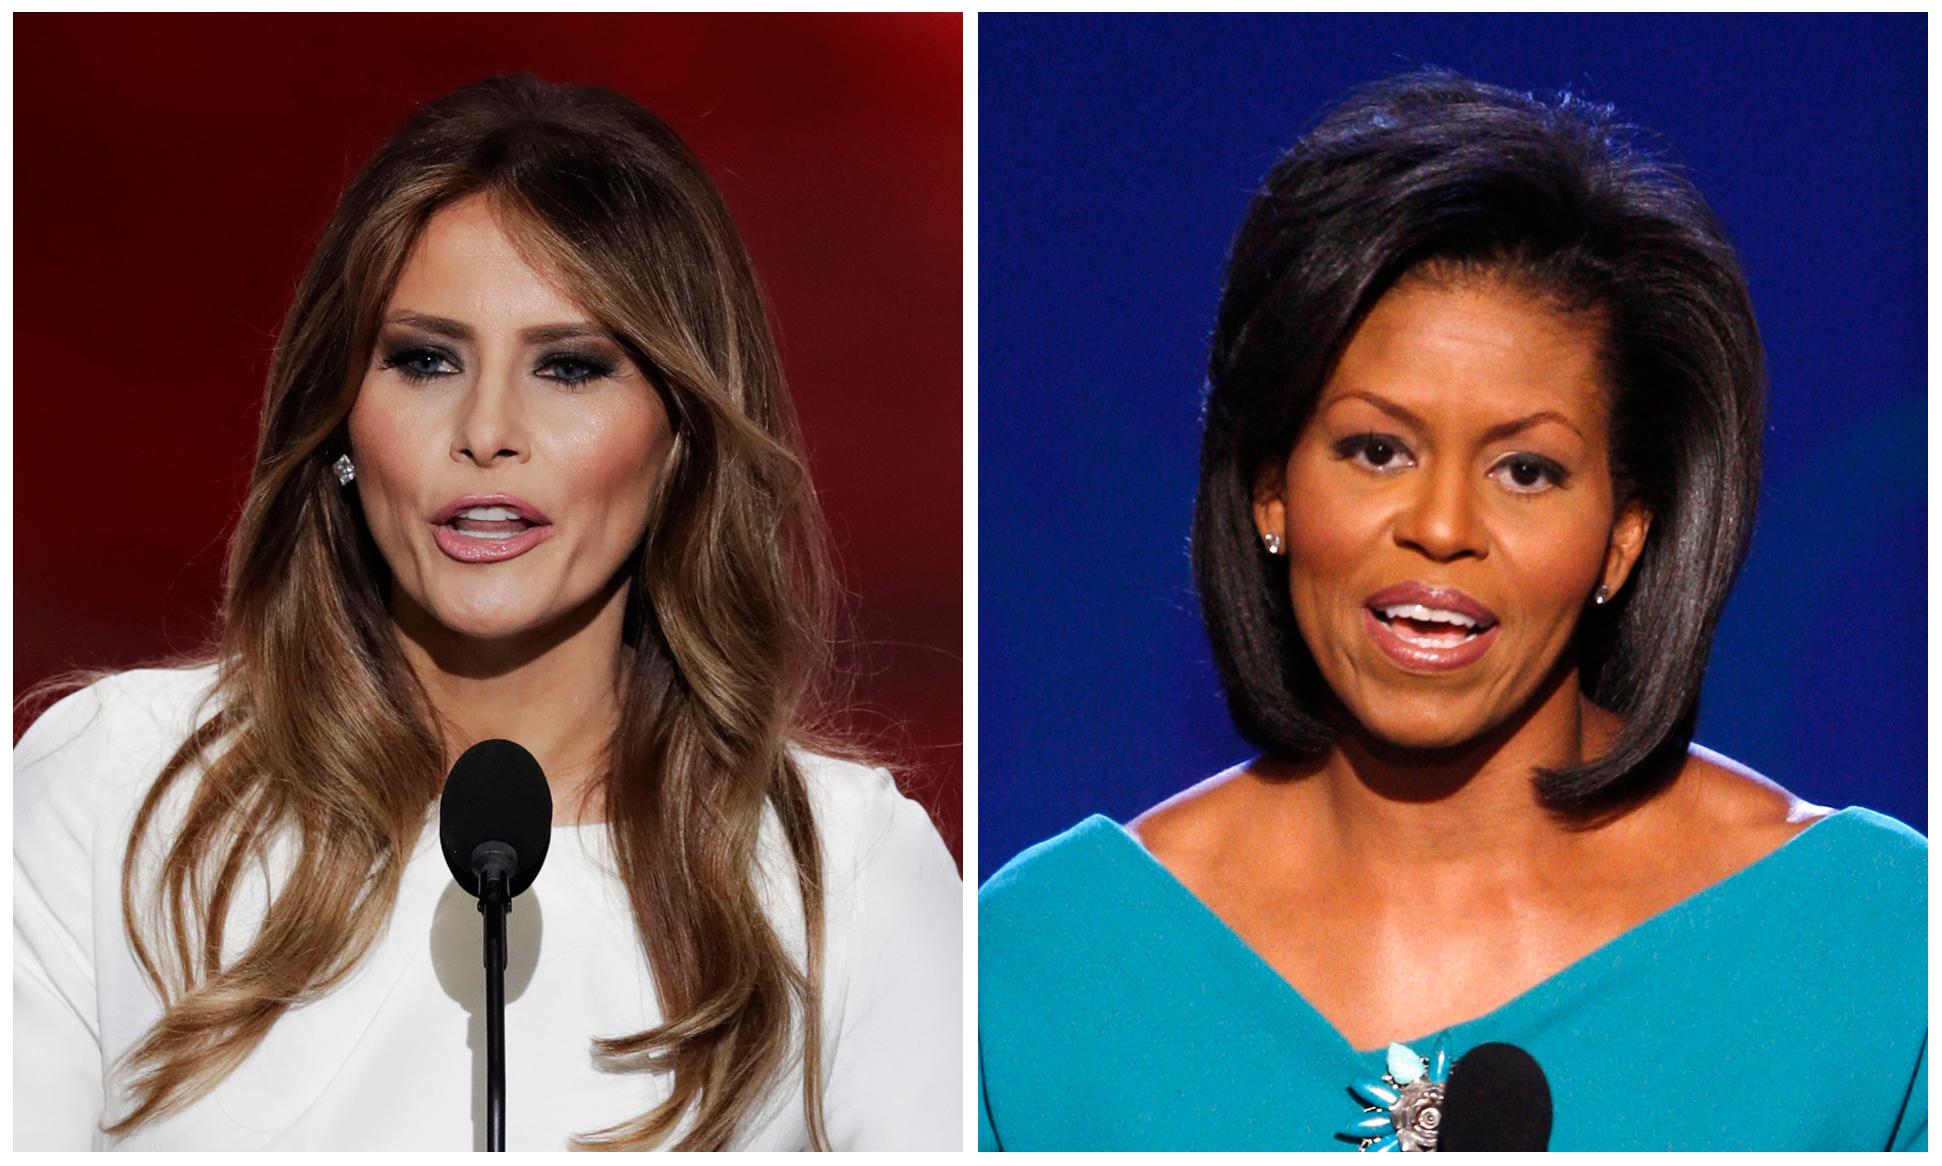 GOP 2016 Convention Melania Trumps Speech